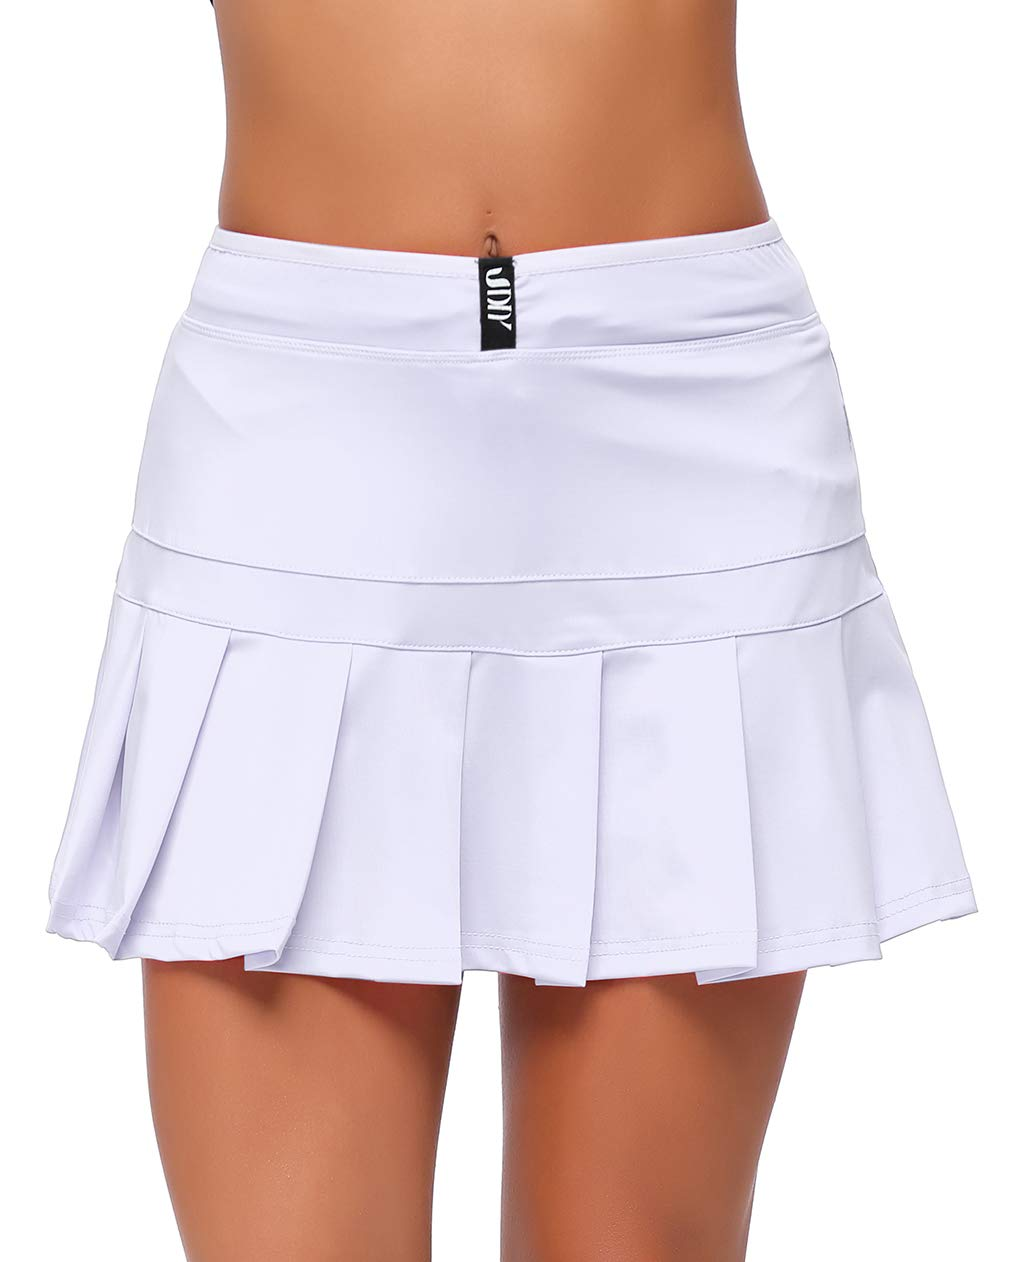 UDIY Women Tennis Skorts with Pocket with Pocket by UDIY